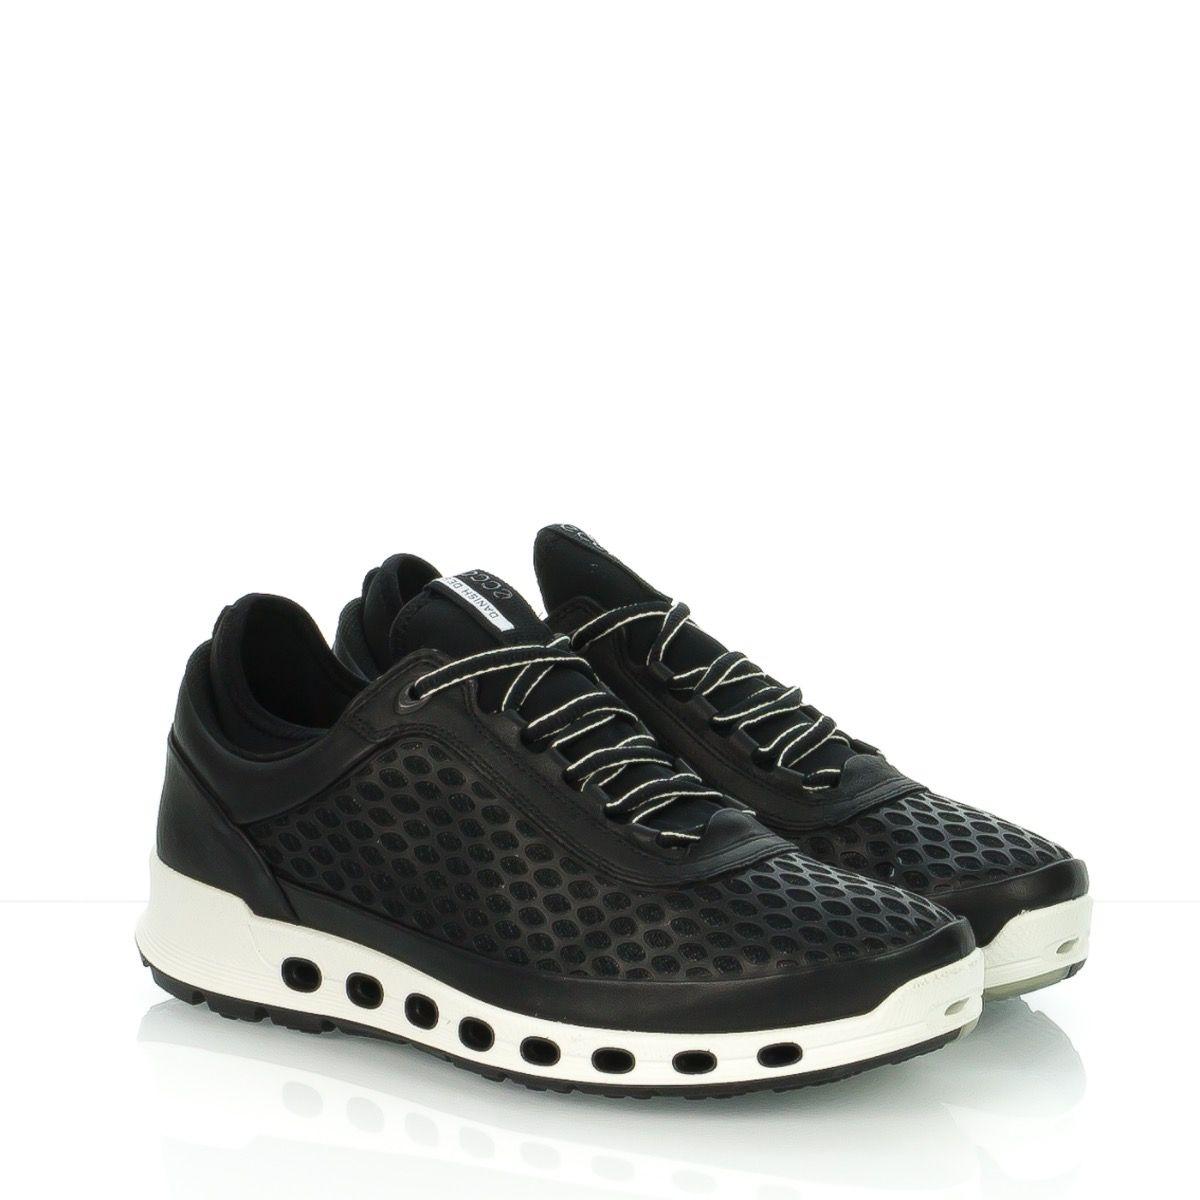 Scarpa Ecco 2 842504 0 Pelle Sneaker Cool Surrond Uomo Goretex 08nOkwP